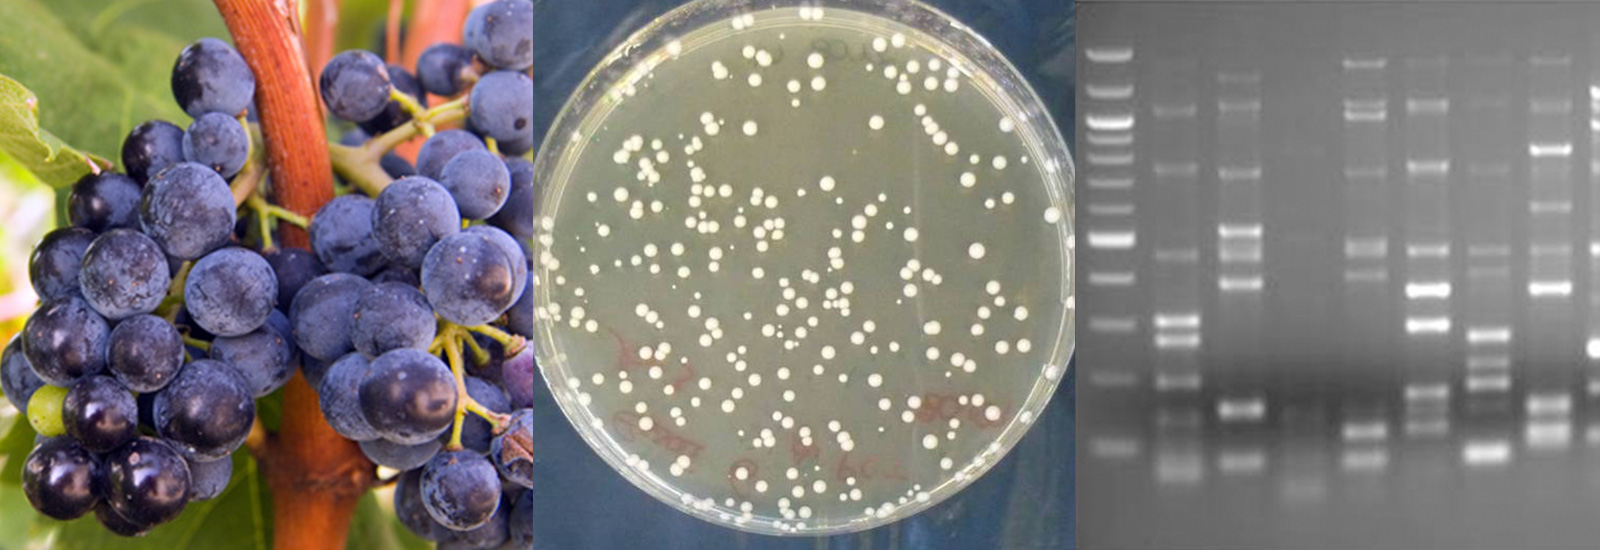 microflora aquitaine analyse microbiologie vin Bordeaux